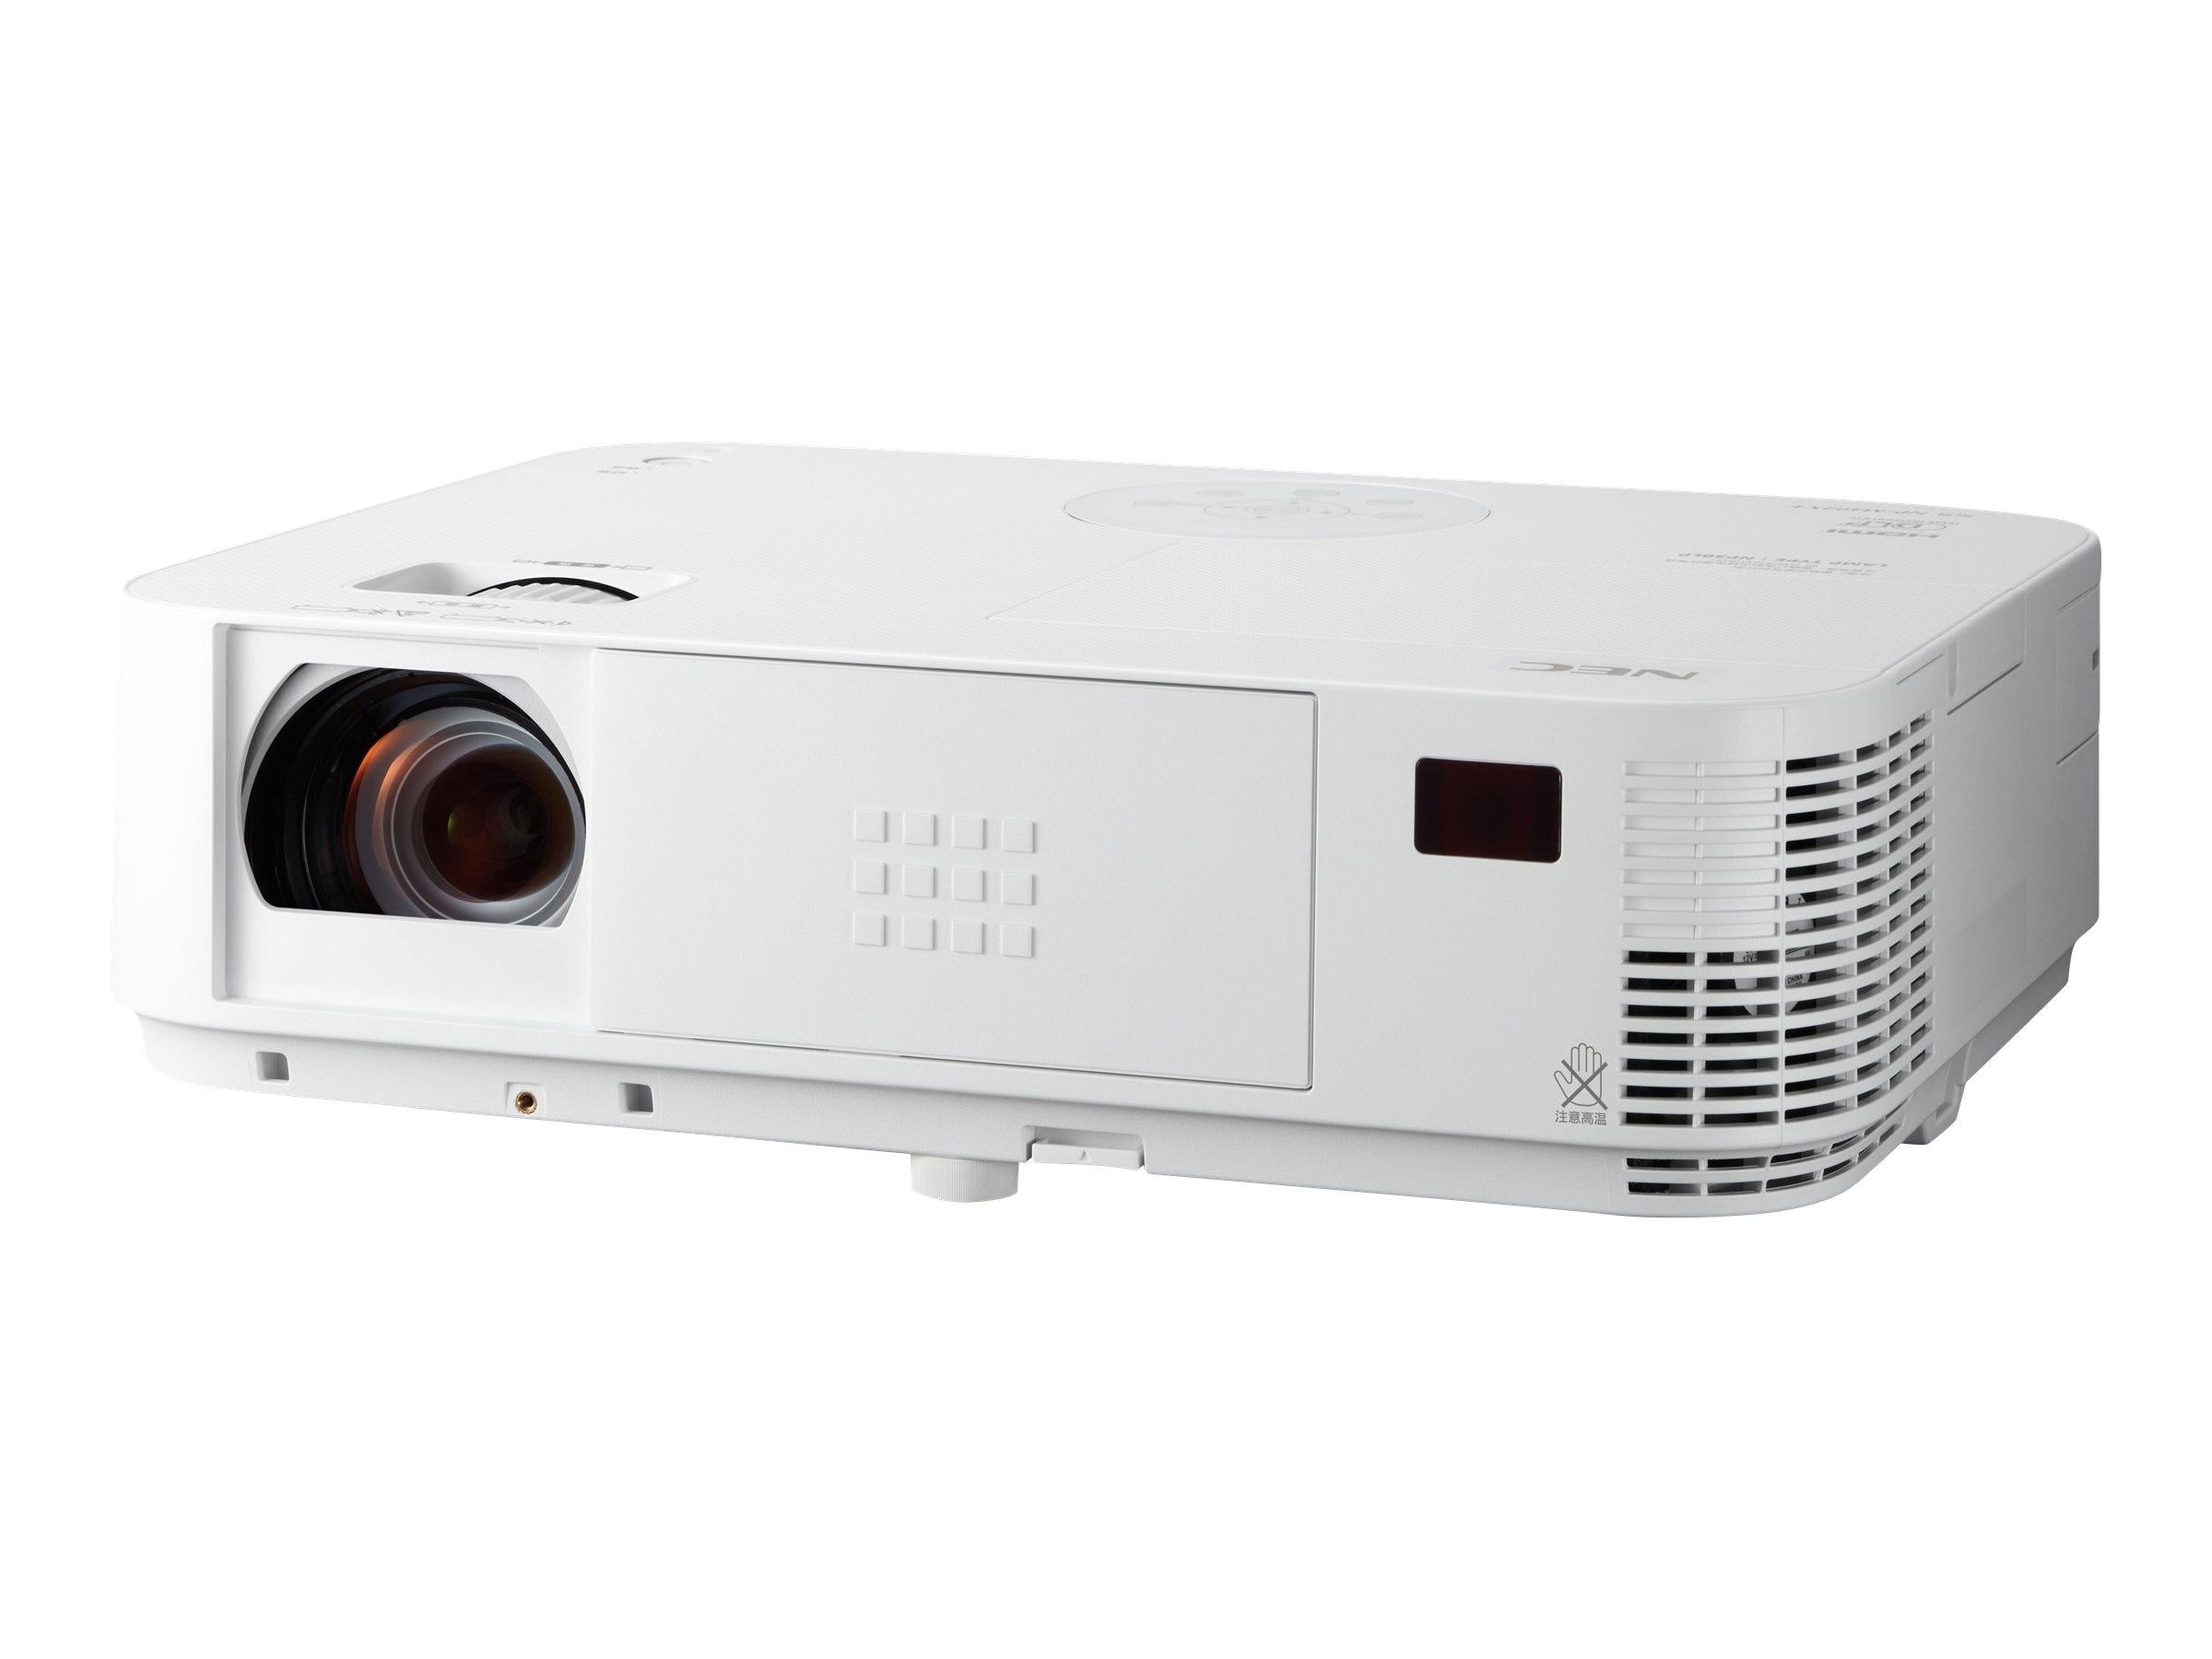 NEC NP-M403H Image 1